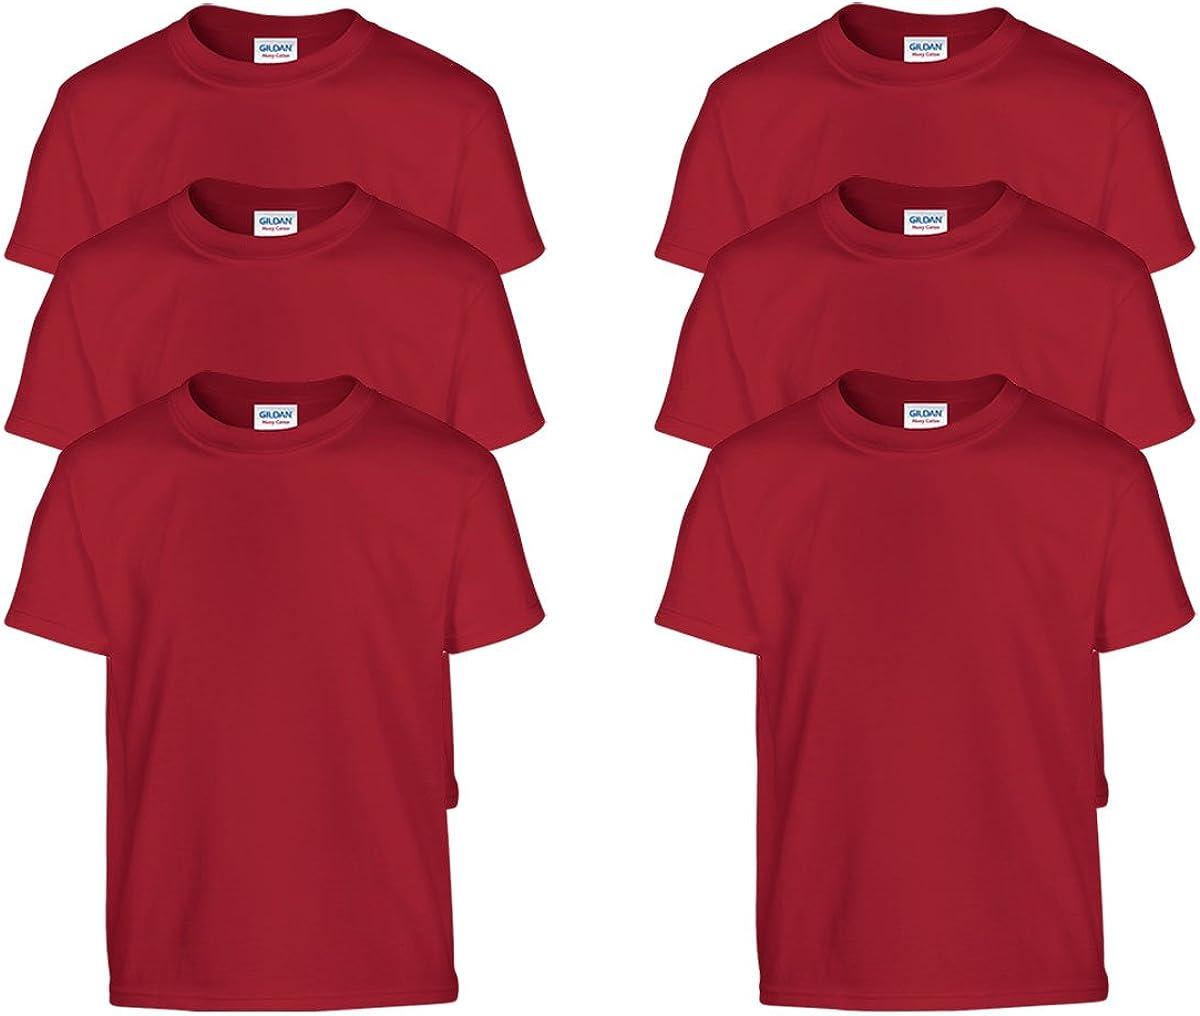 Gildan Boys Heavy Cotton 100/% Cotton T-Shirt Pack of 6